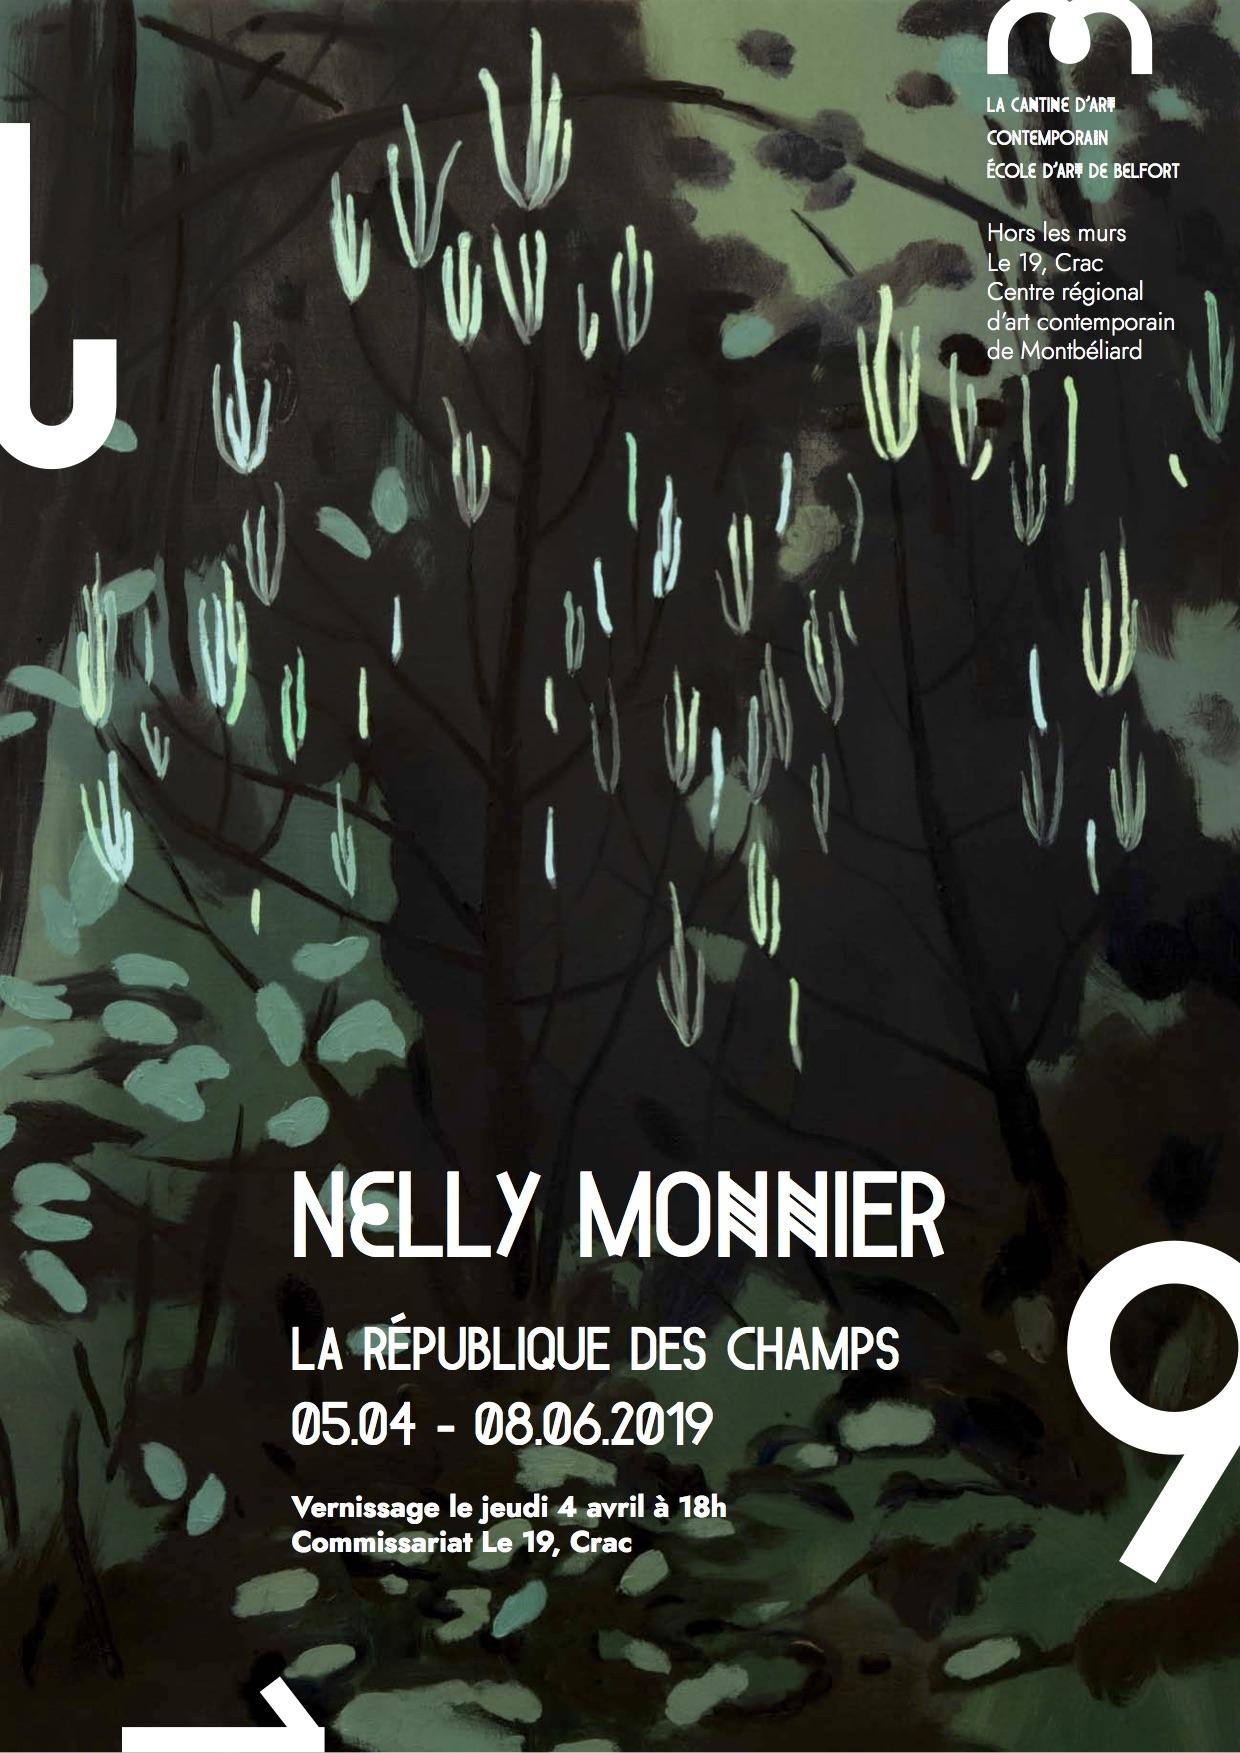 DPNellyMonnier-19crac-Belfort-web2